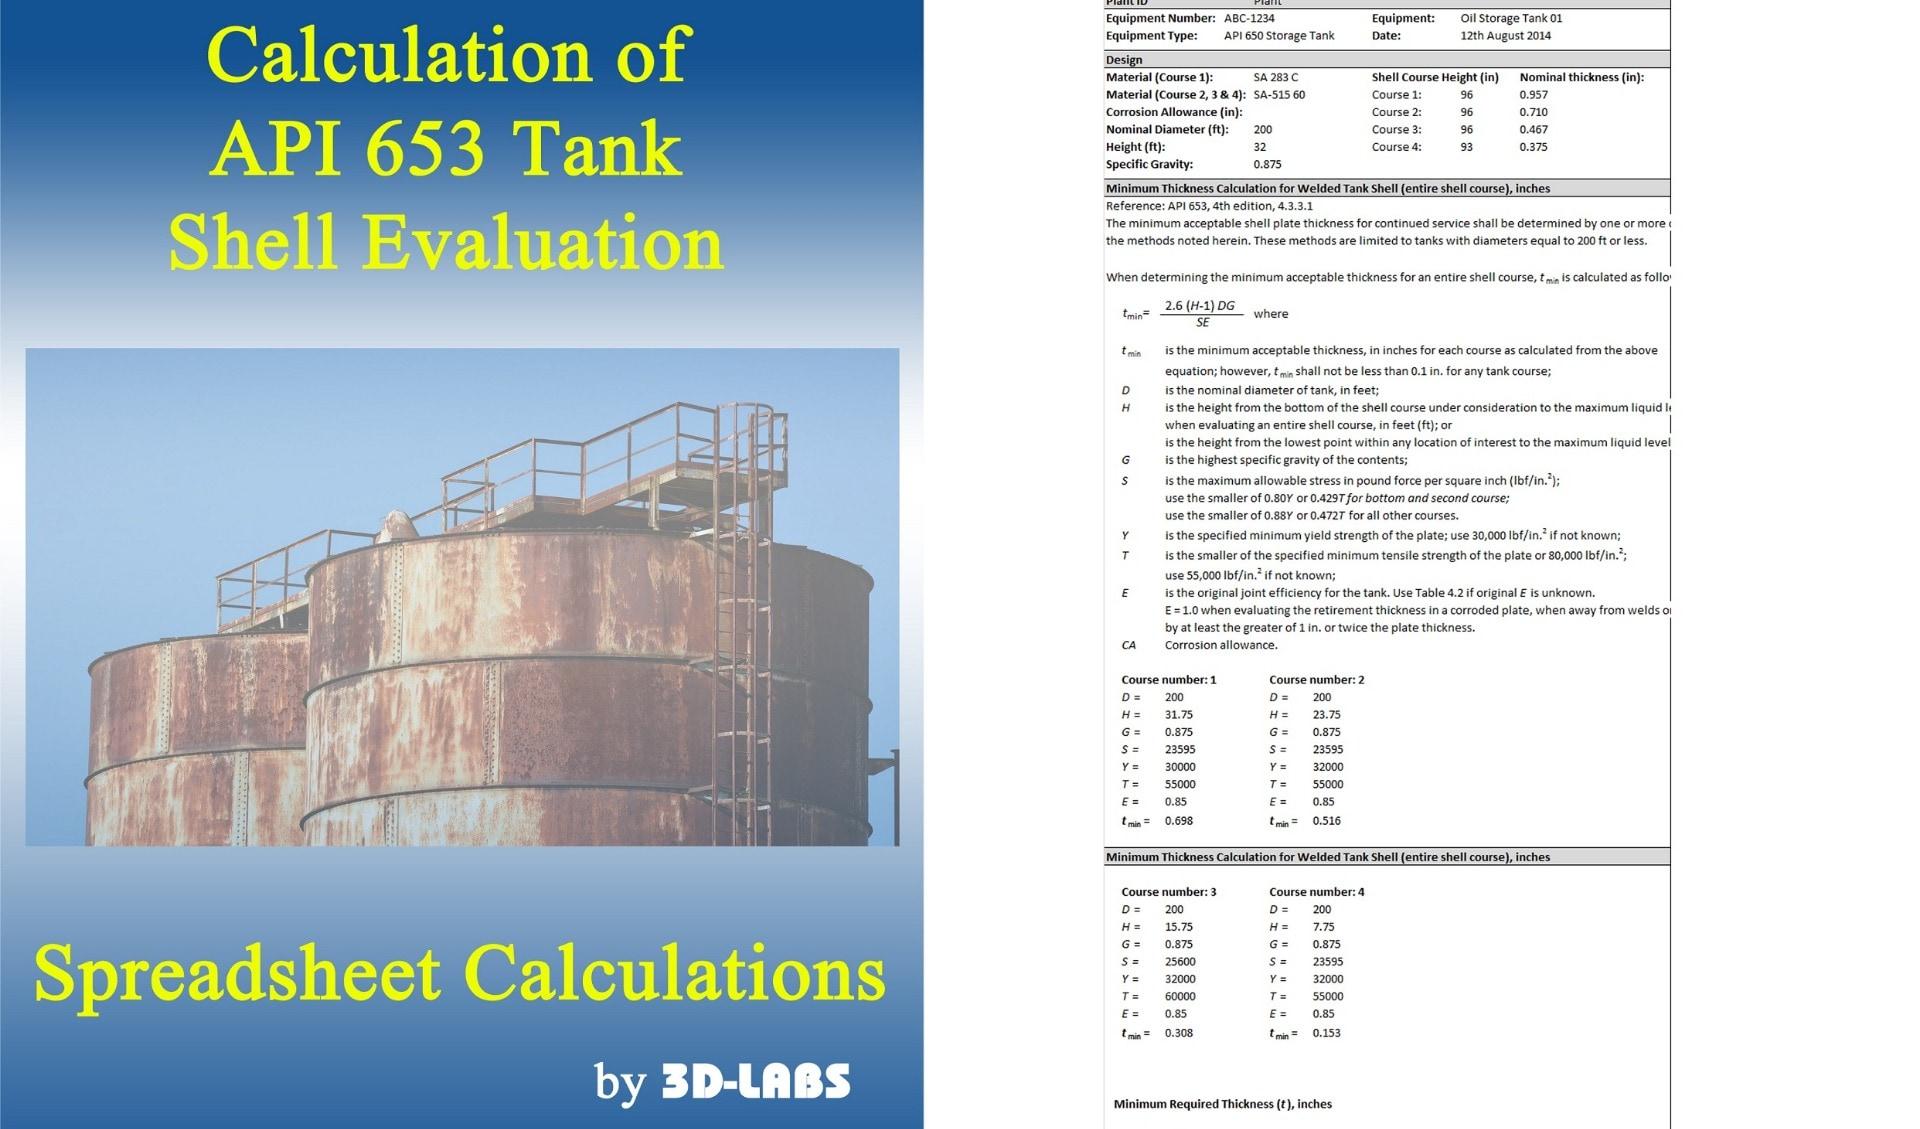 API 653 Tank Shell Evaluation